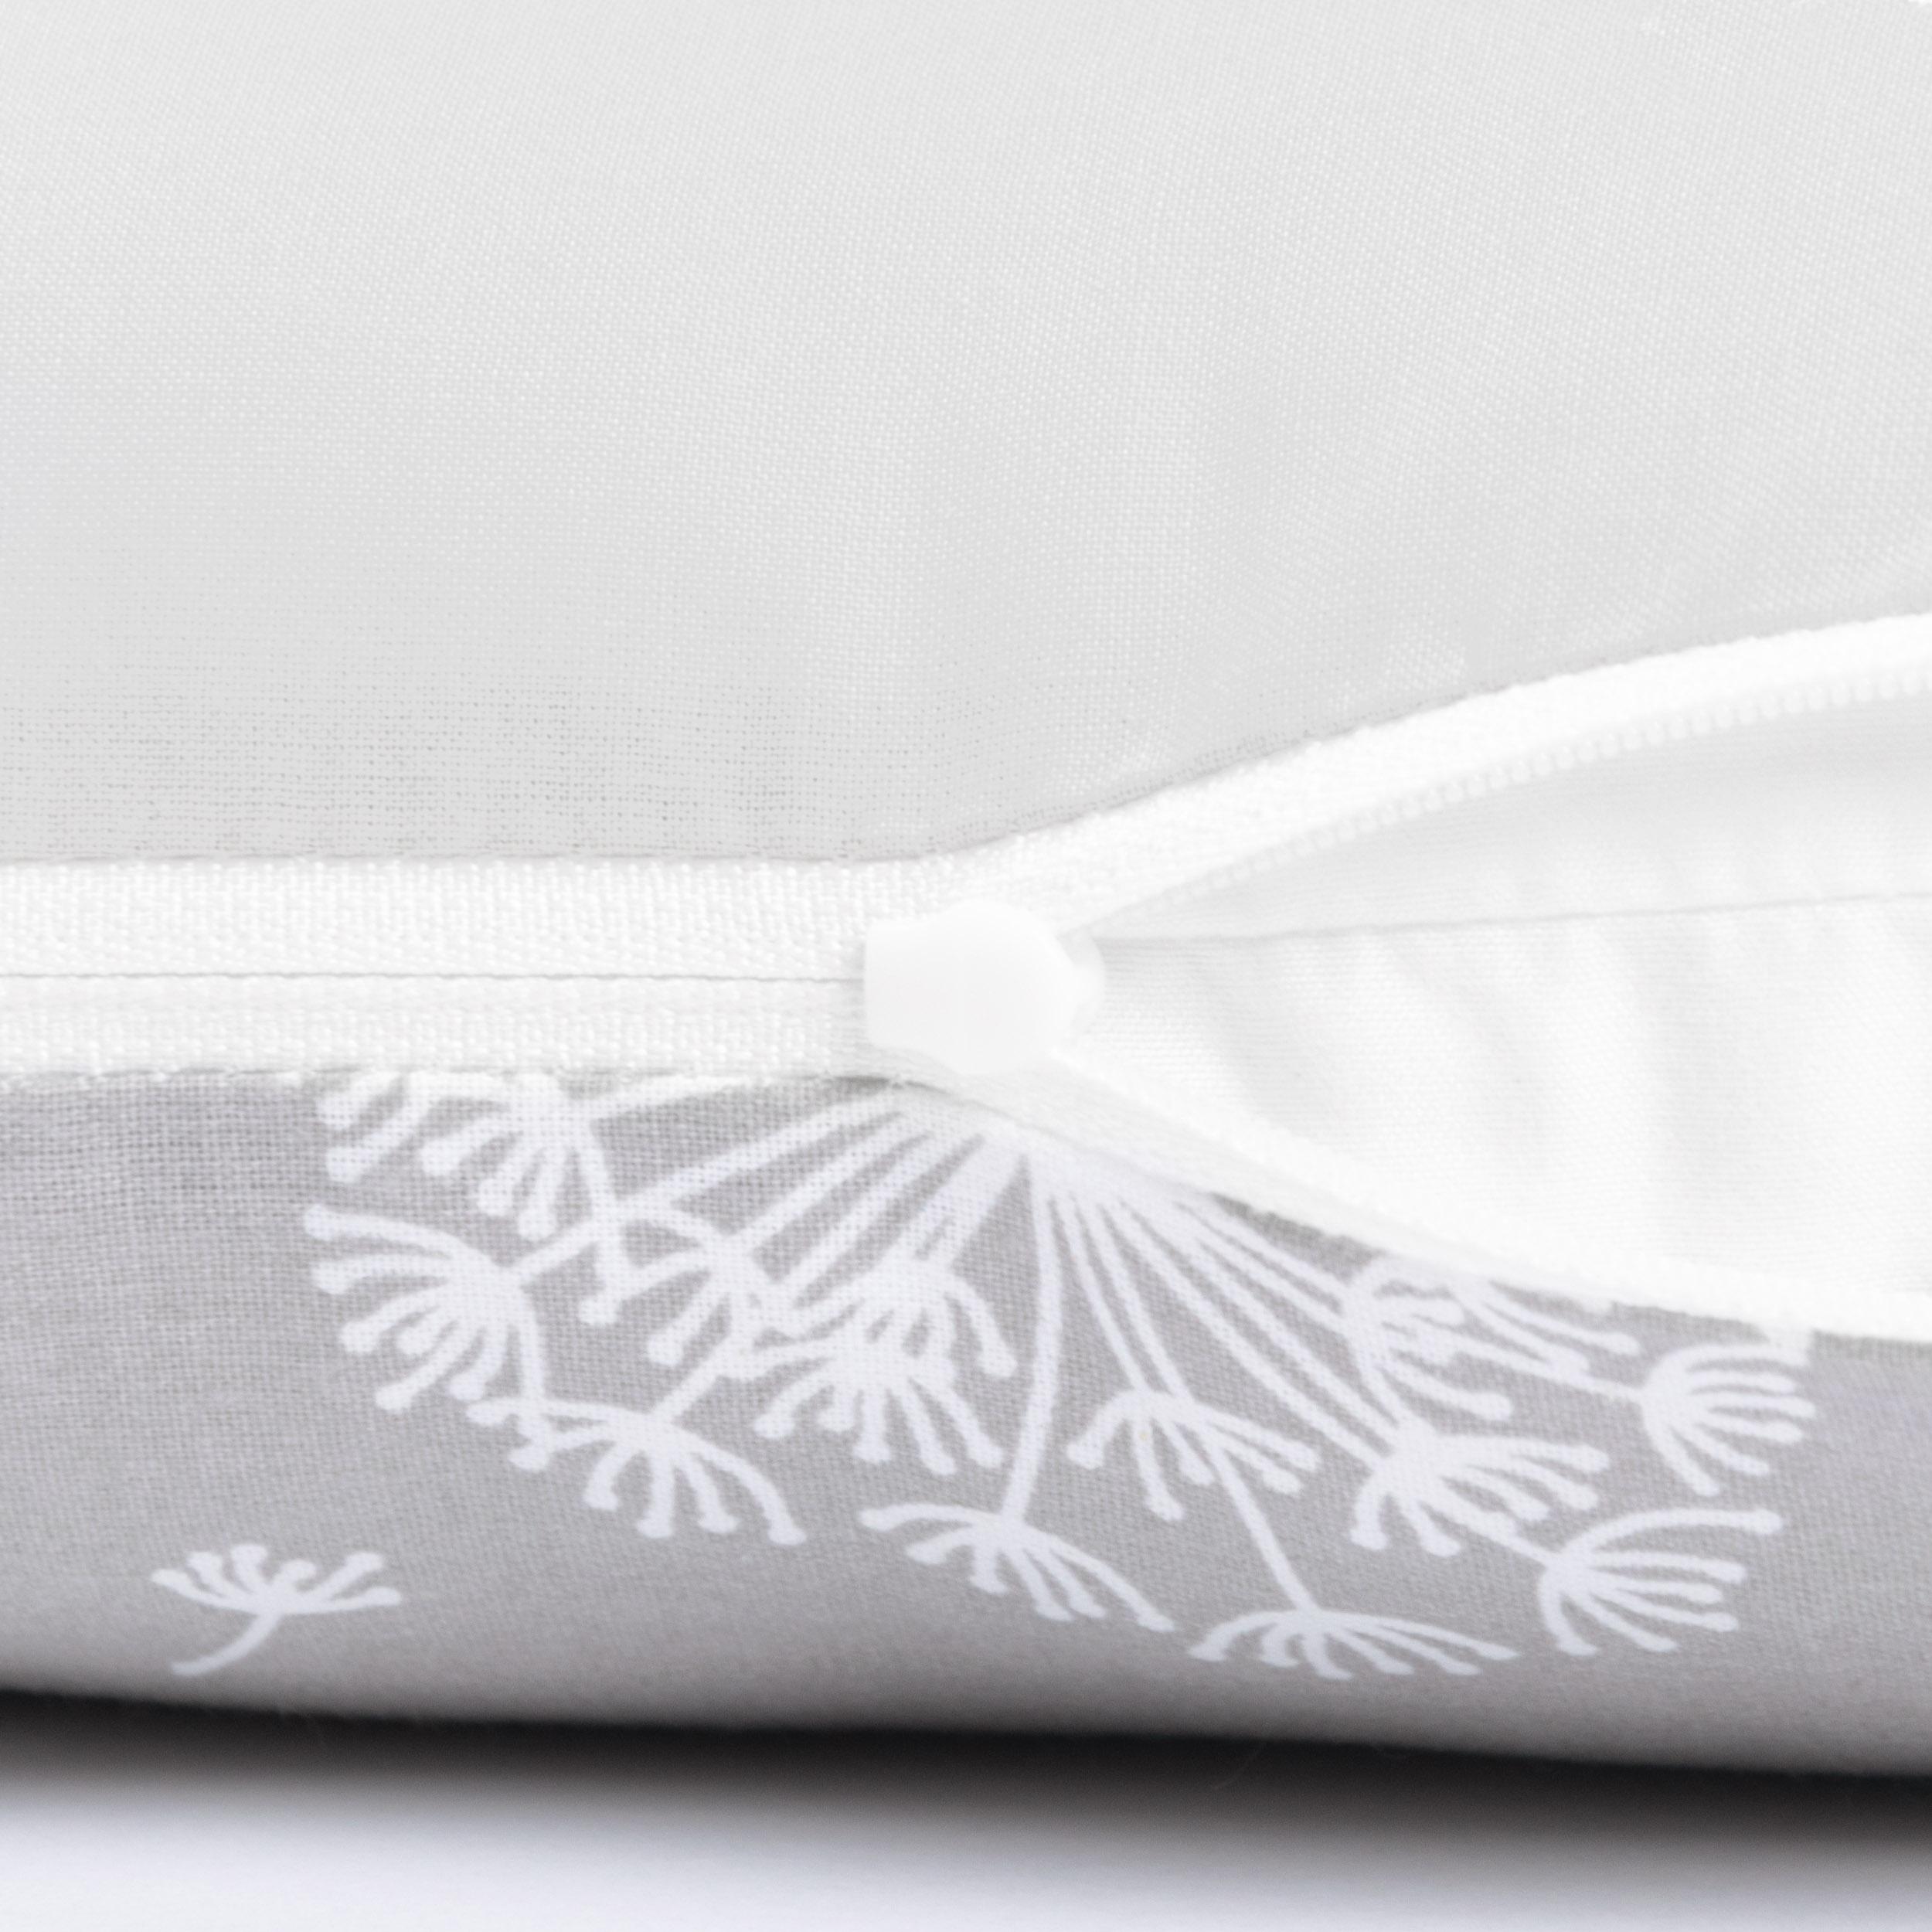 Kissen 40 x 20 cm mit Namen Datum Pusteblume Grau Hellgrau